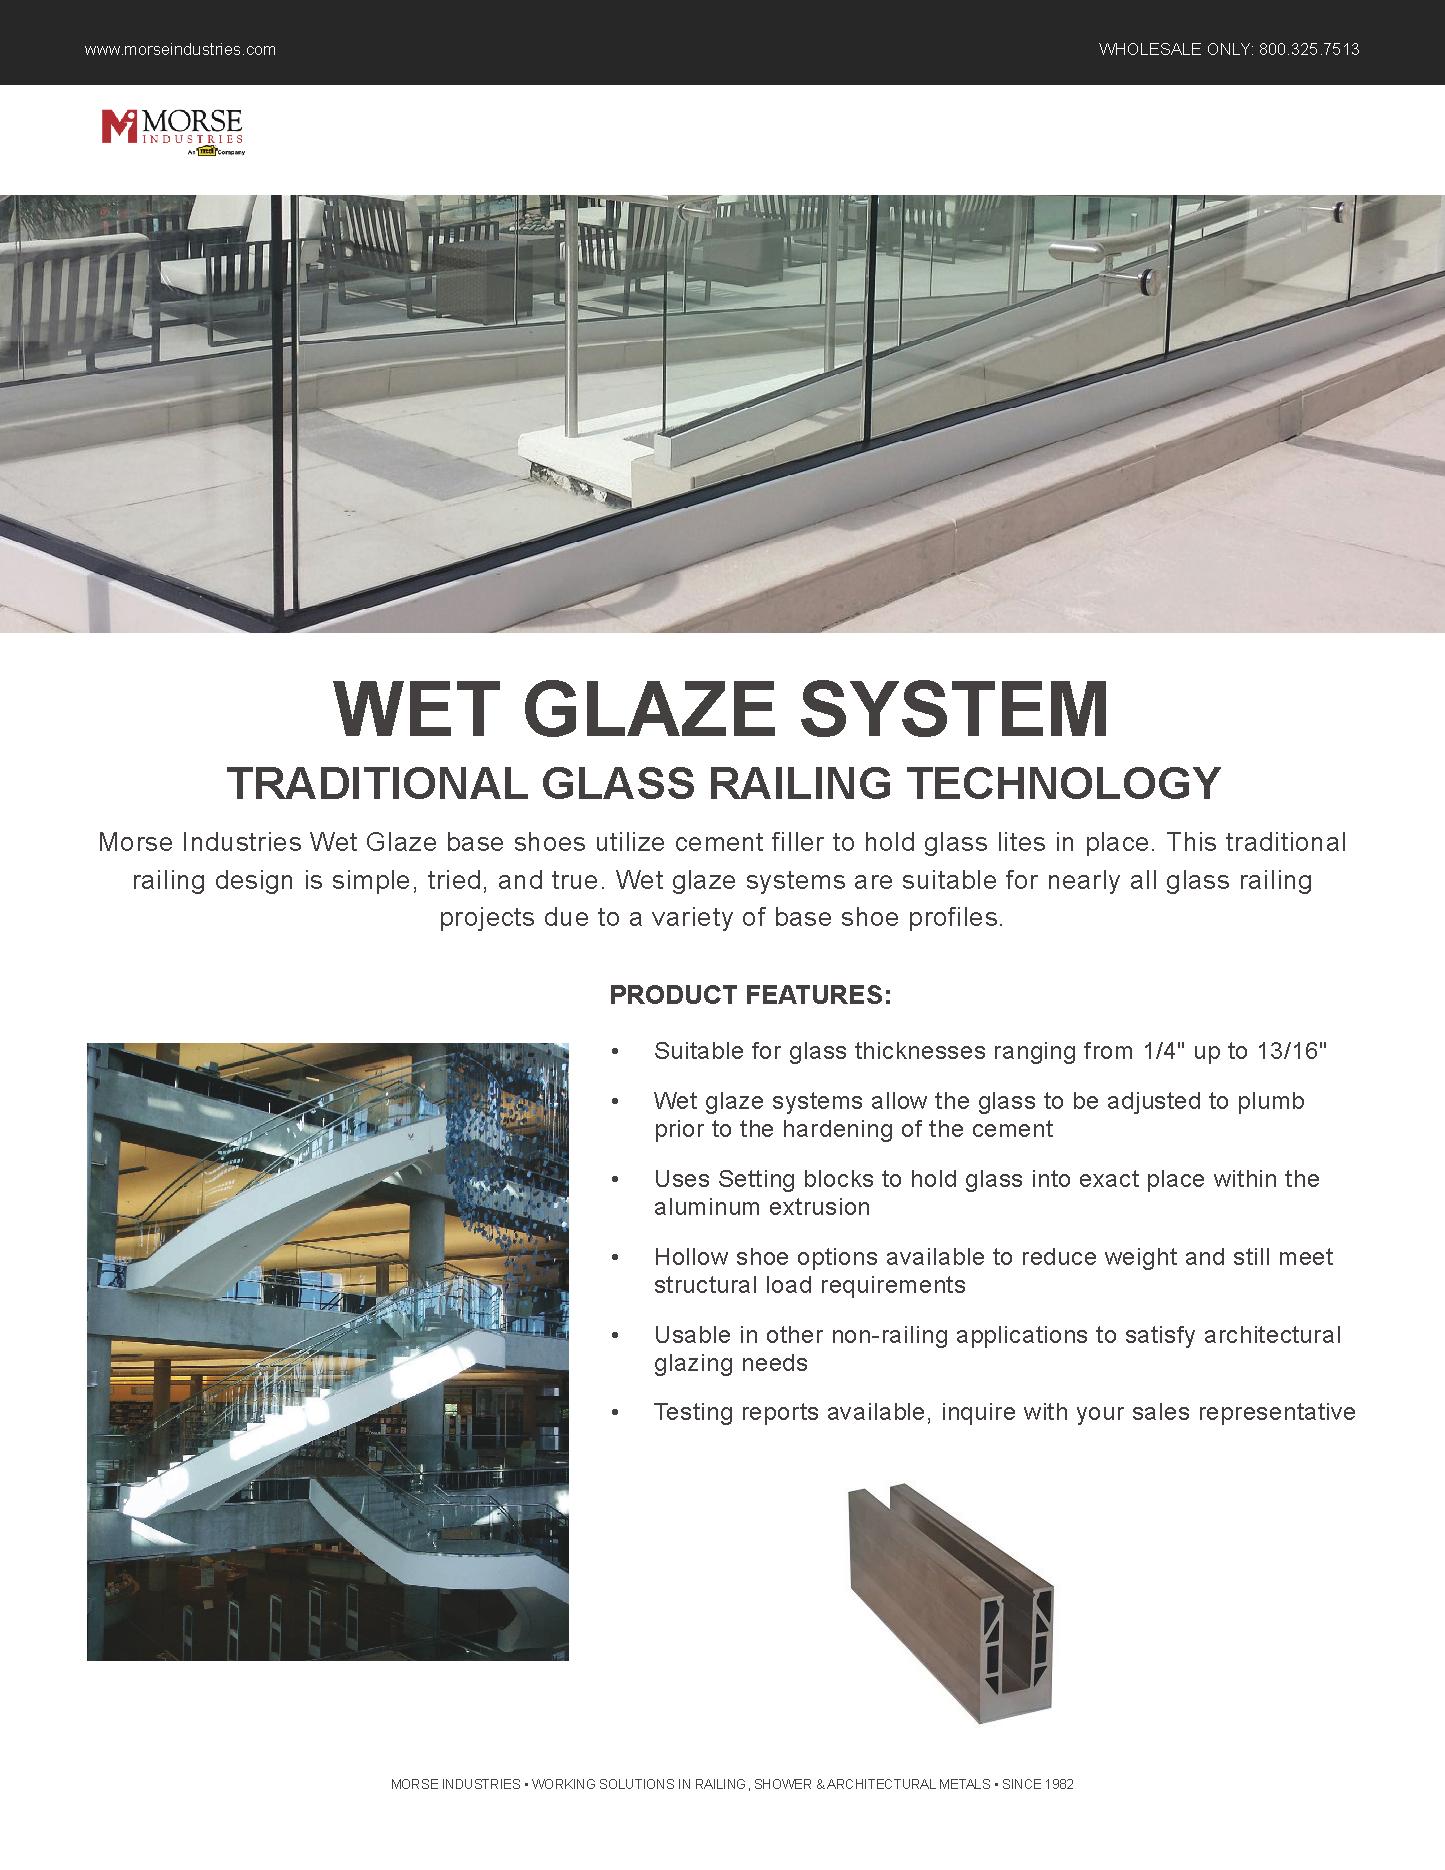 Wet Glaze Railing v1.0_Page_1